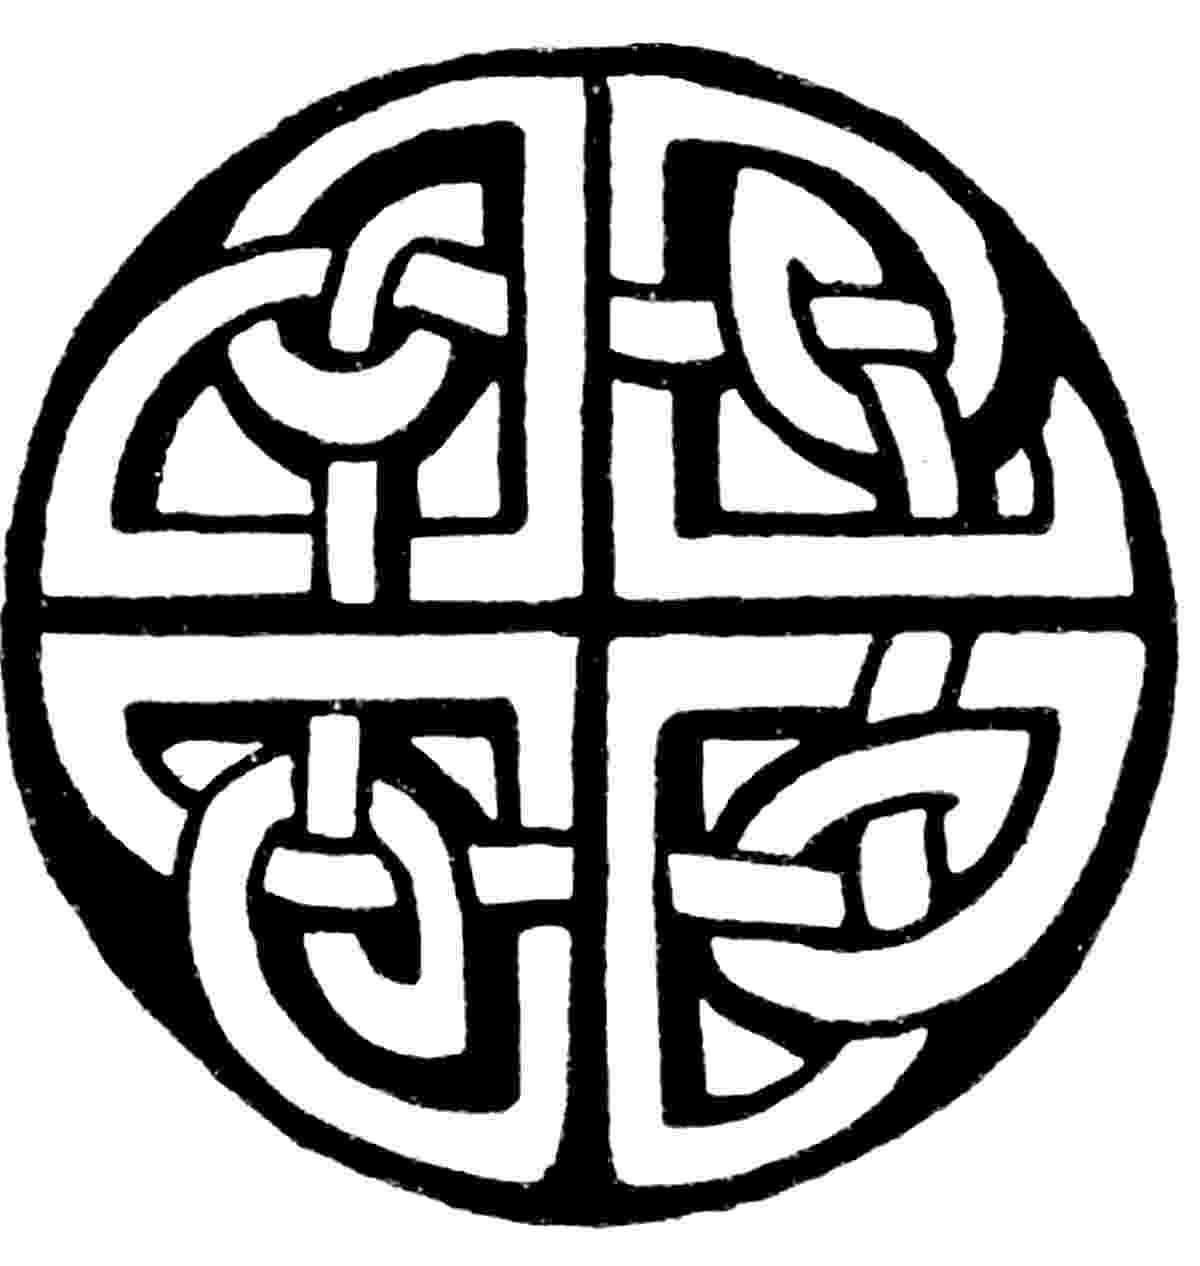 celtic art klymer klatsch the collective unconscious mandalas and art celtic